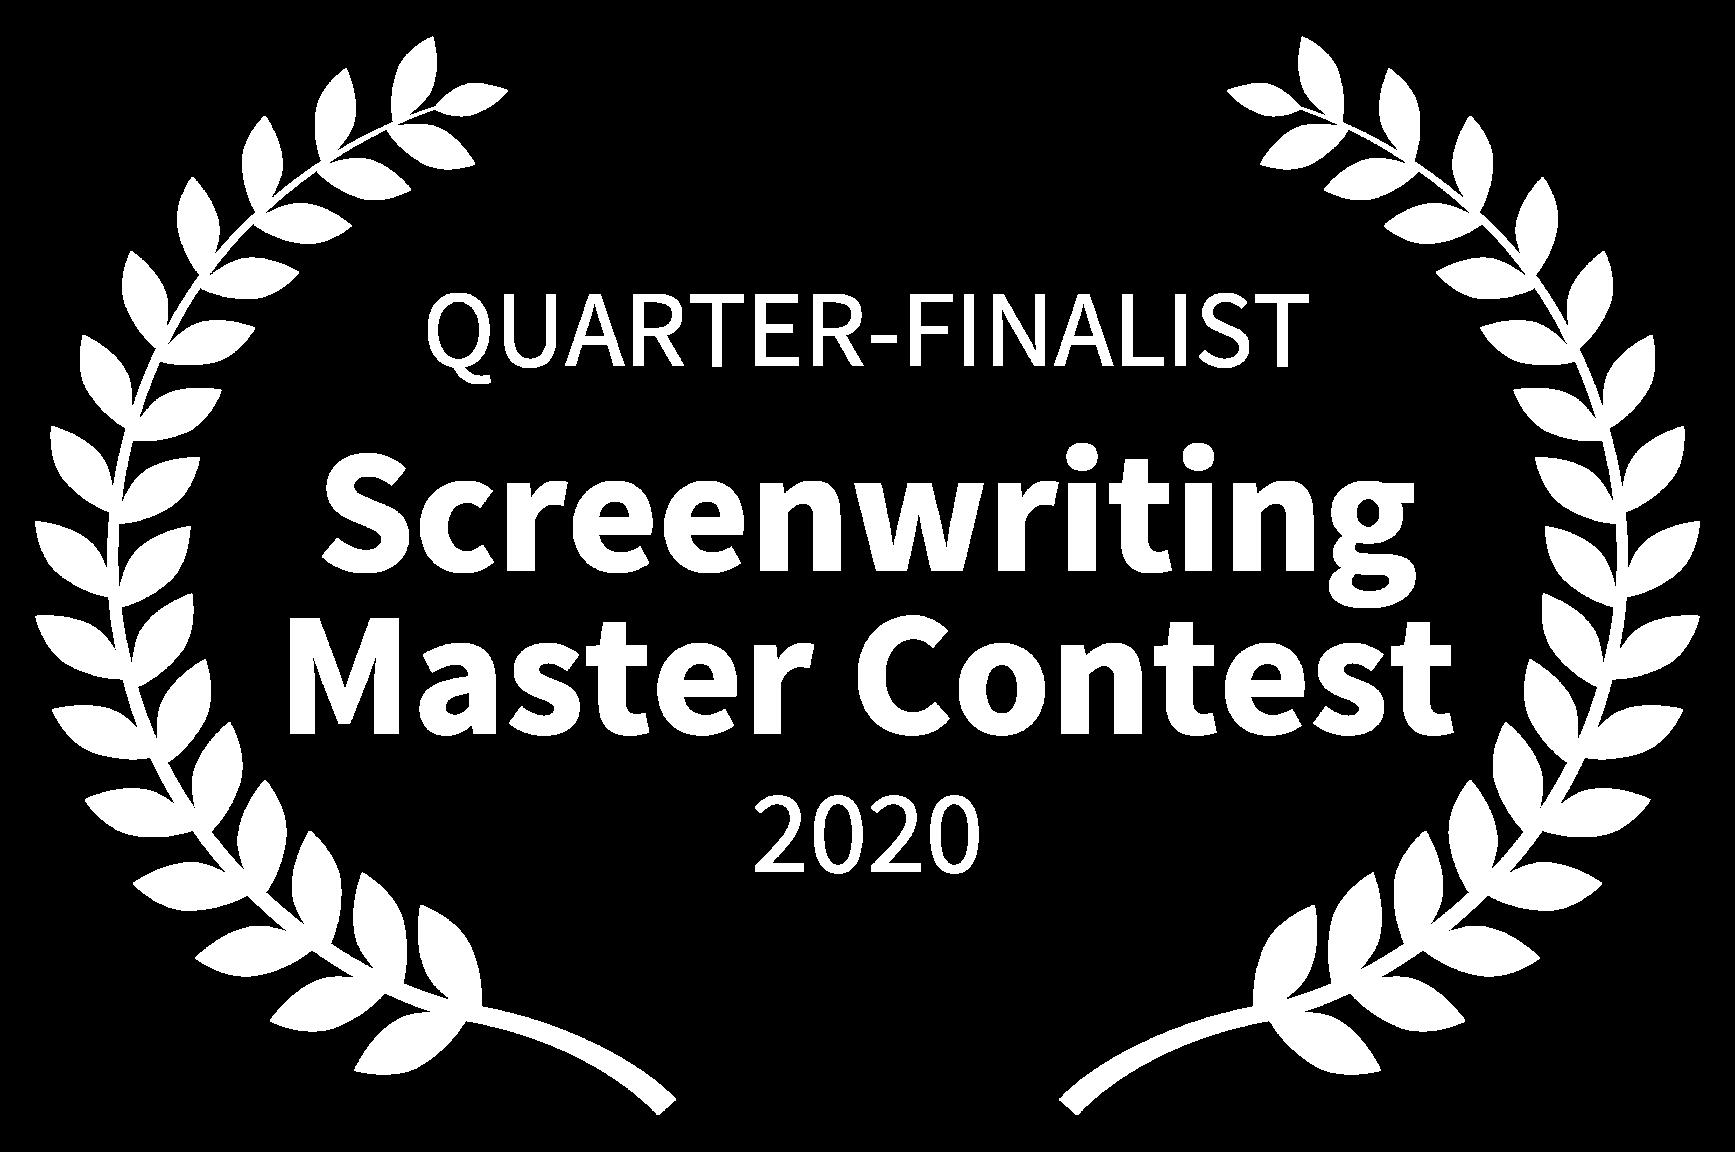 QUARTER-FINALIST - Screenwriting Master Contest - 2020